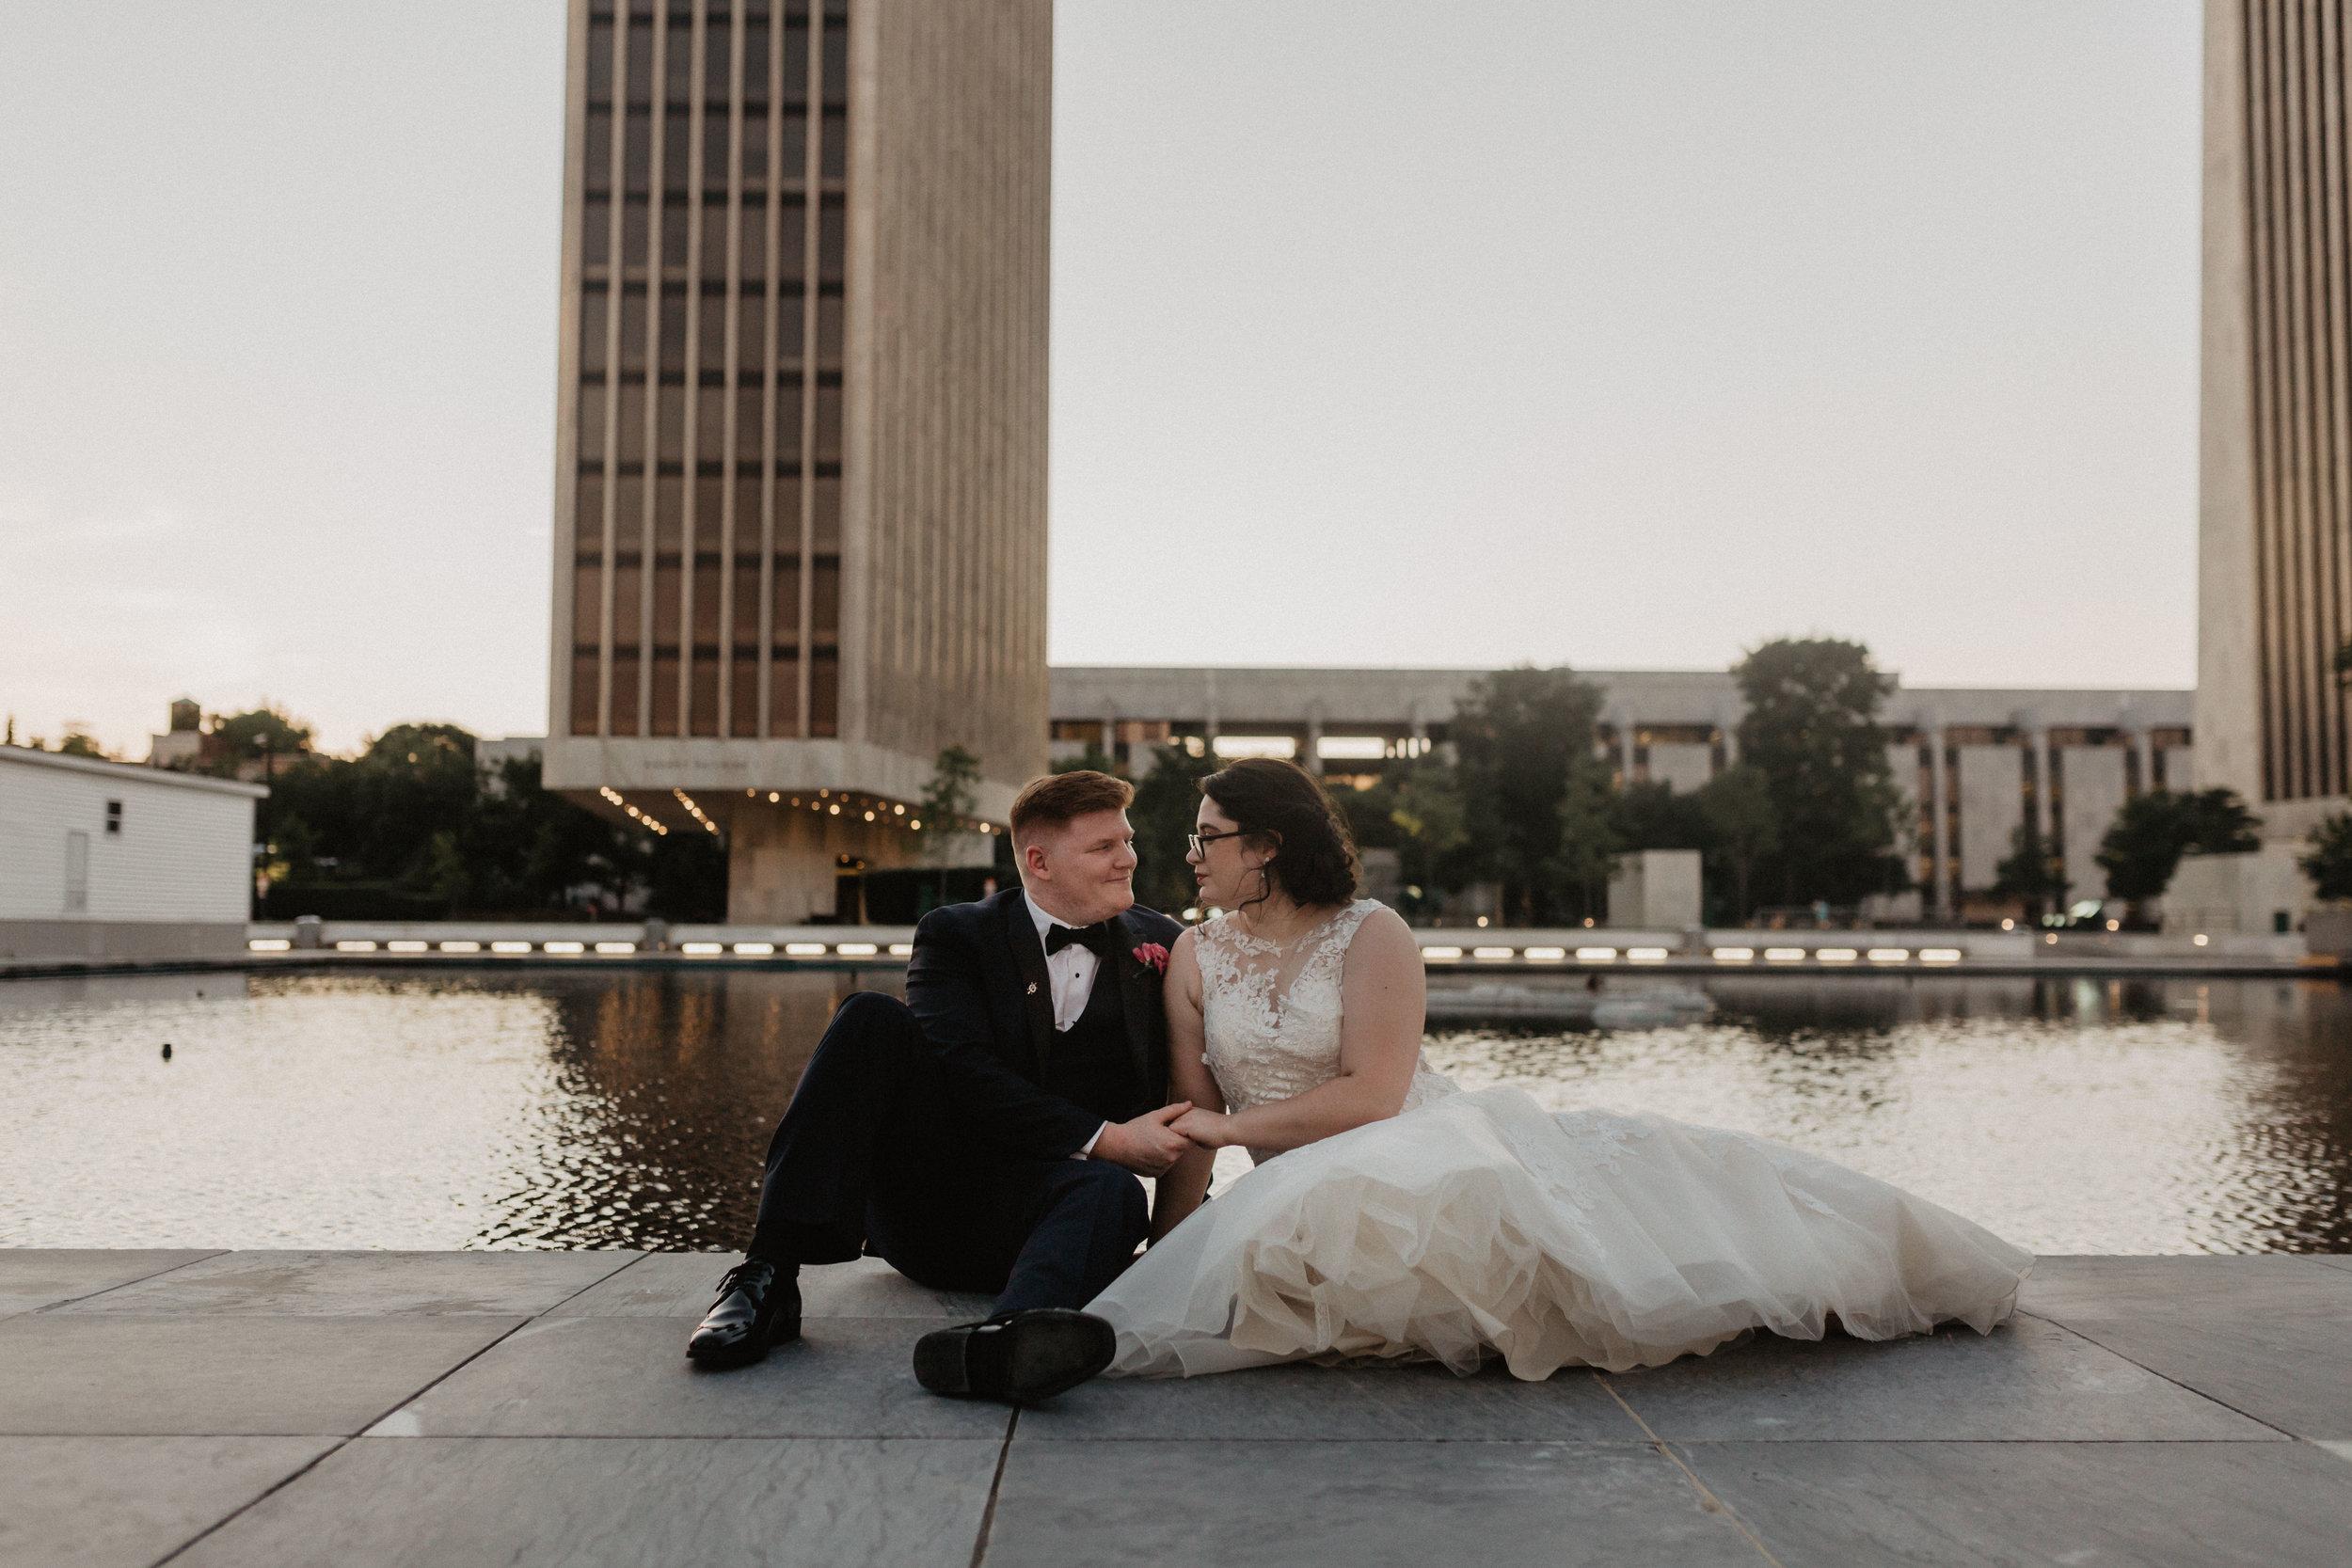 albany-new-york-wedding-72.jpg